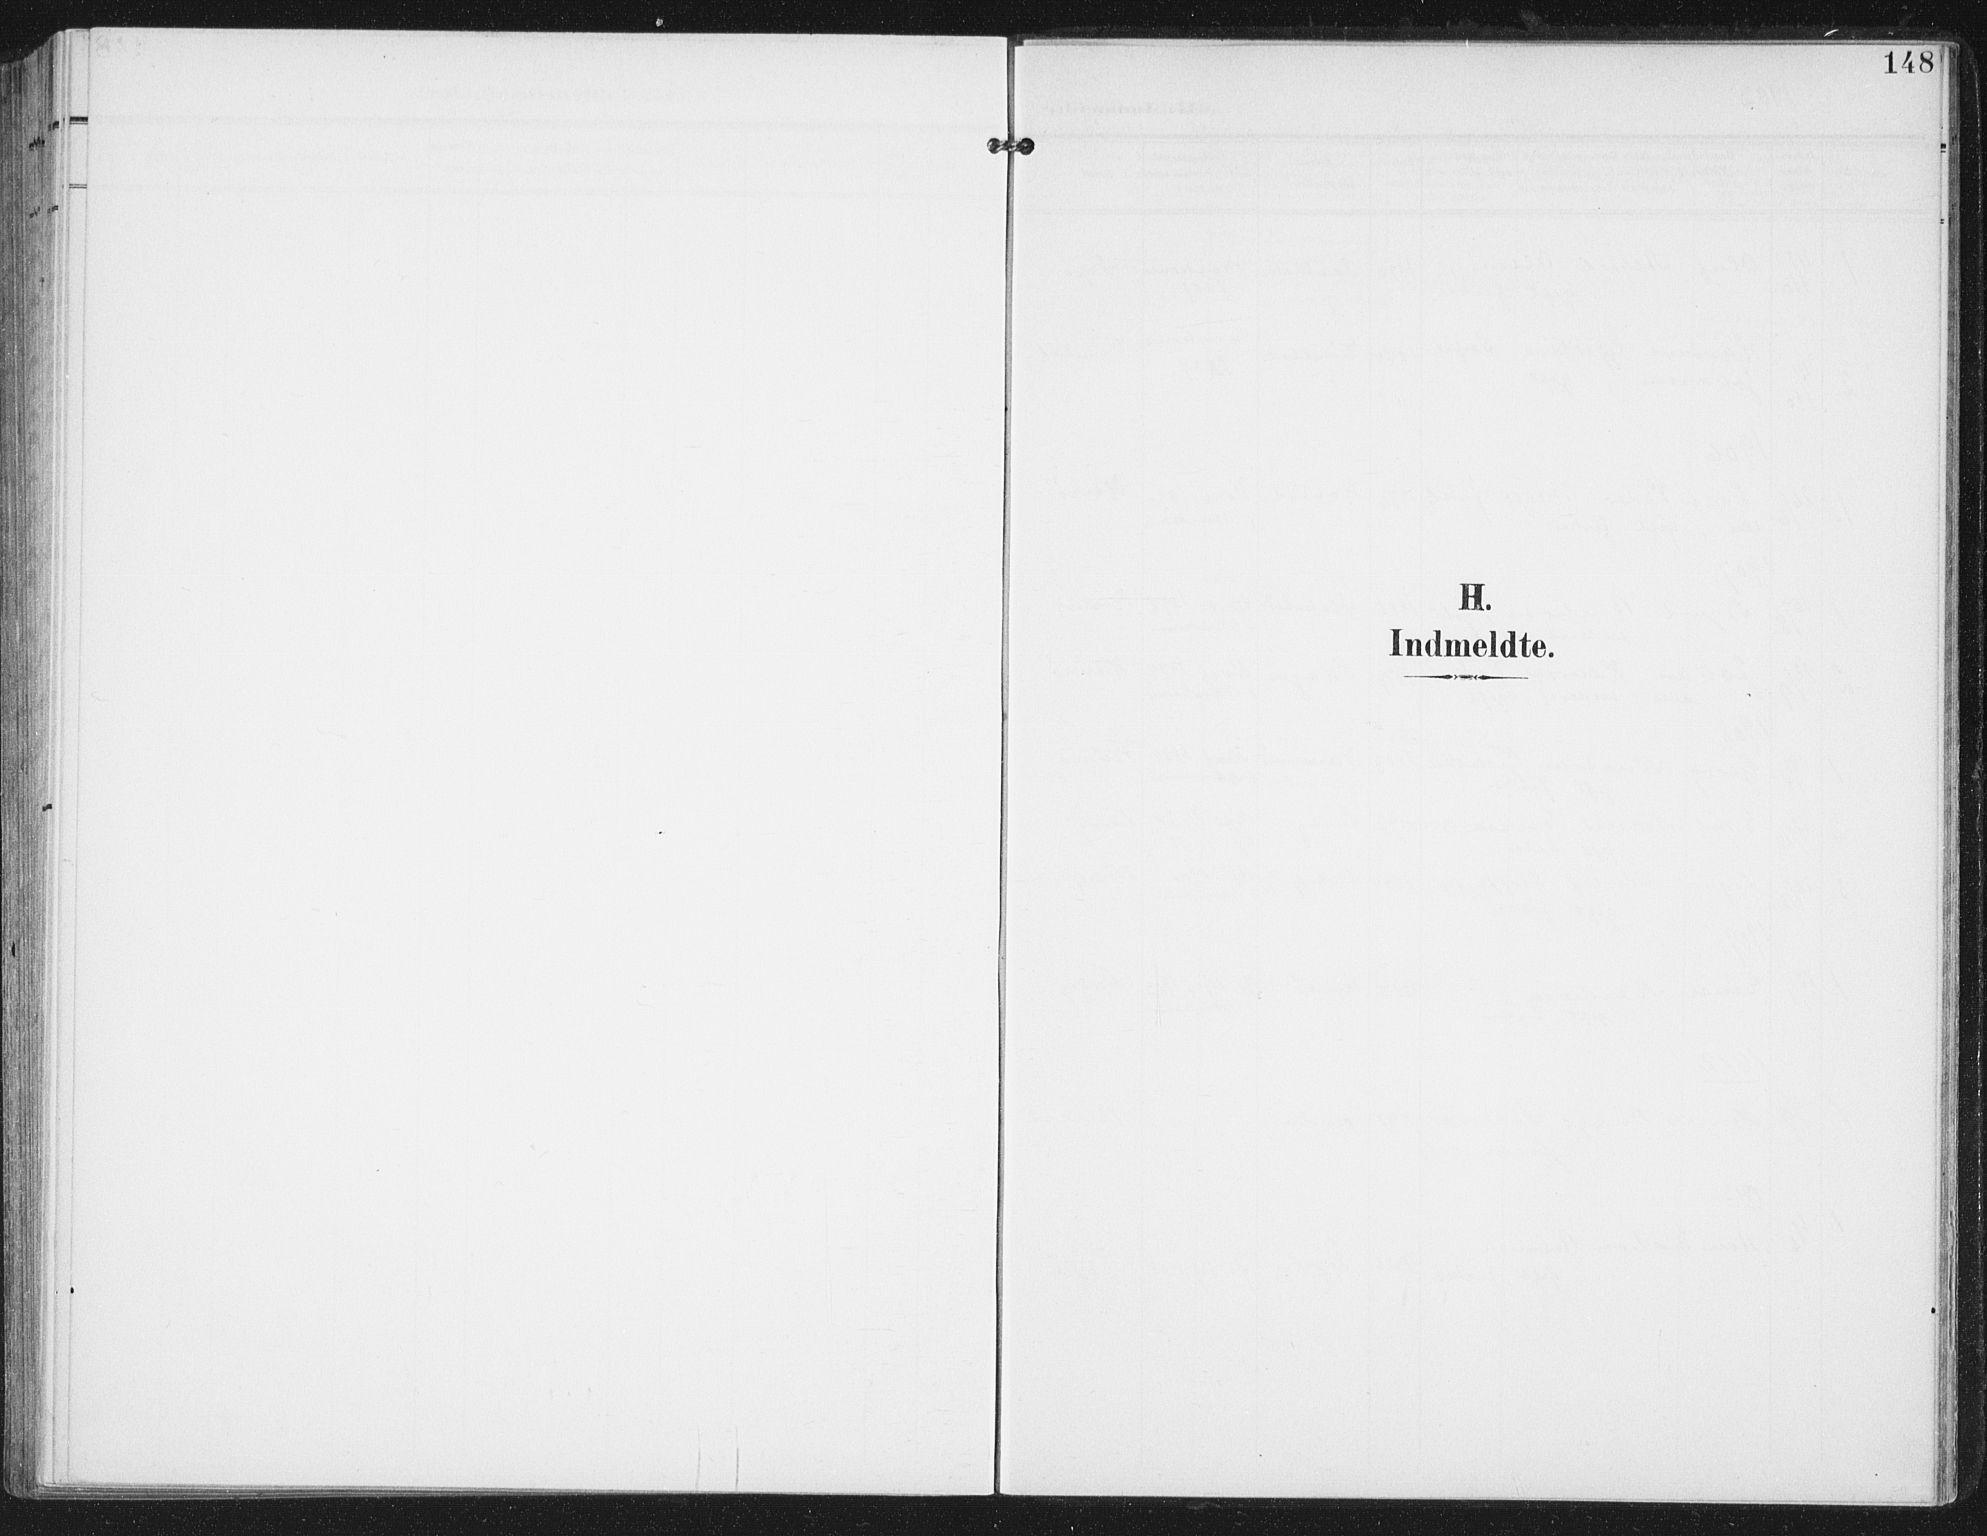 SAT, Ministerialprotokoller, klokkerbøker og fødselsregistre - Nordland, 886/L1221: Ministerialbok nr. 886A03, 1903-1913, s. 148